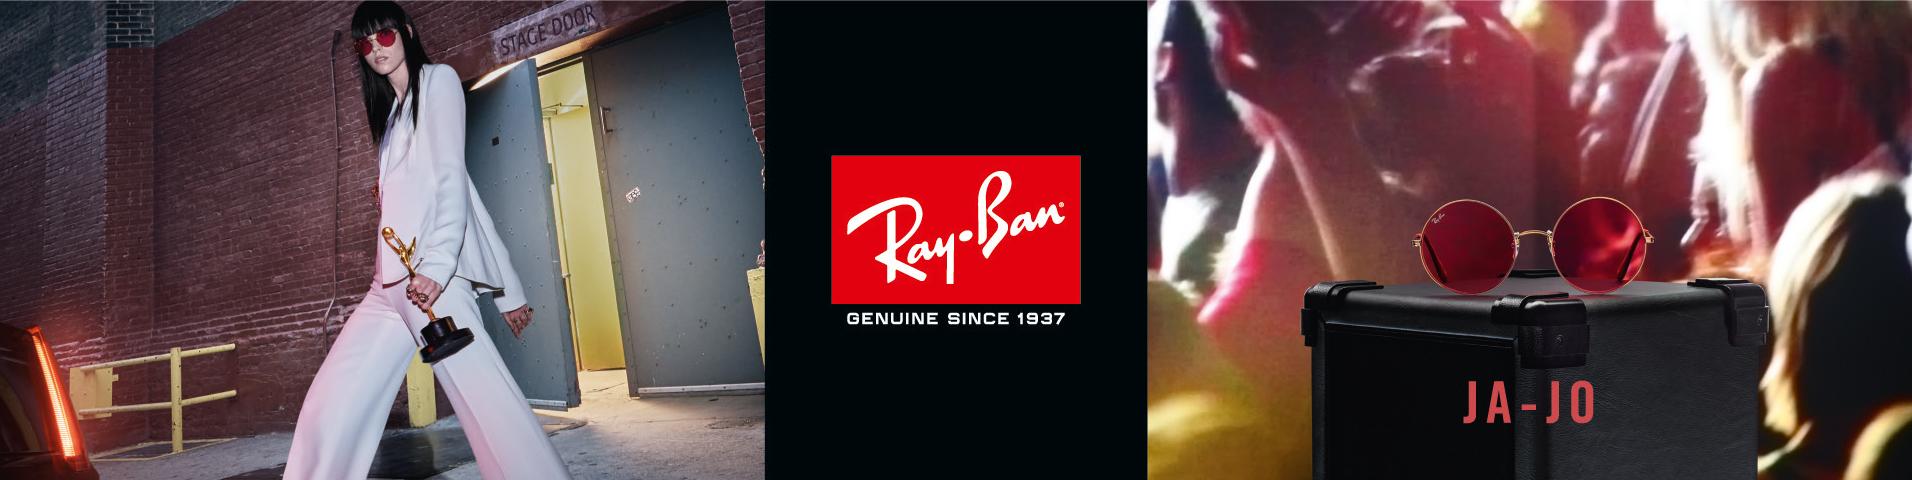 Ray Ban Wayfarer Prix Suisse